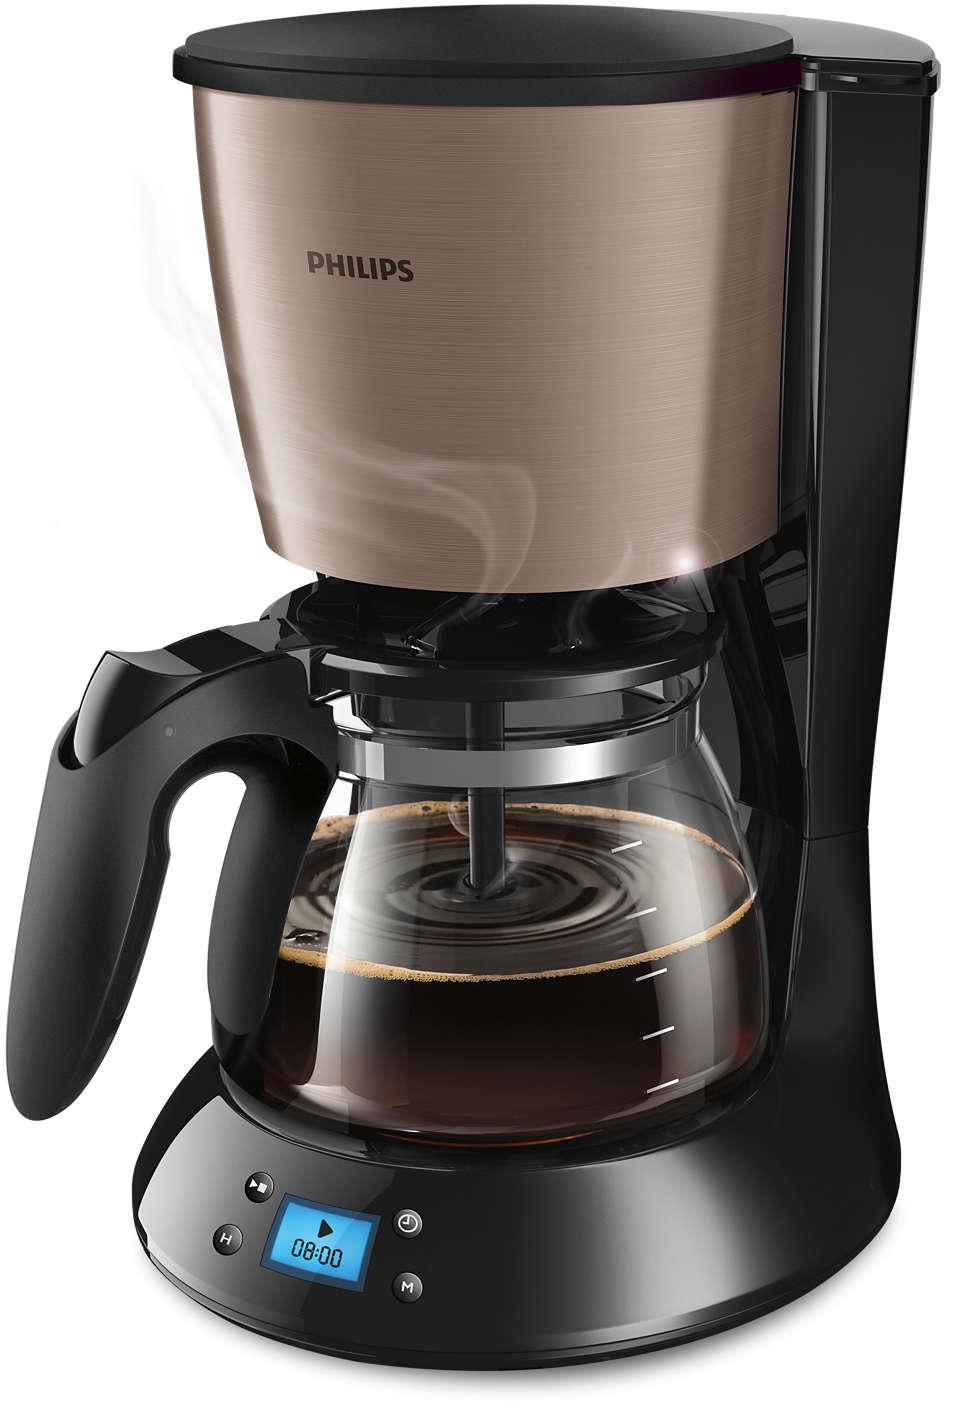 Simply delicious coffee